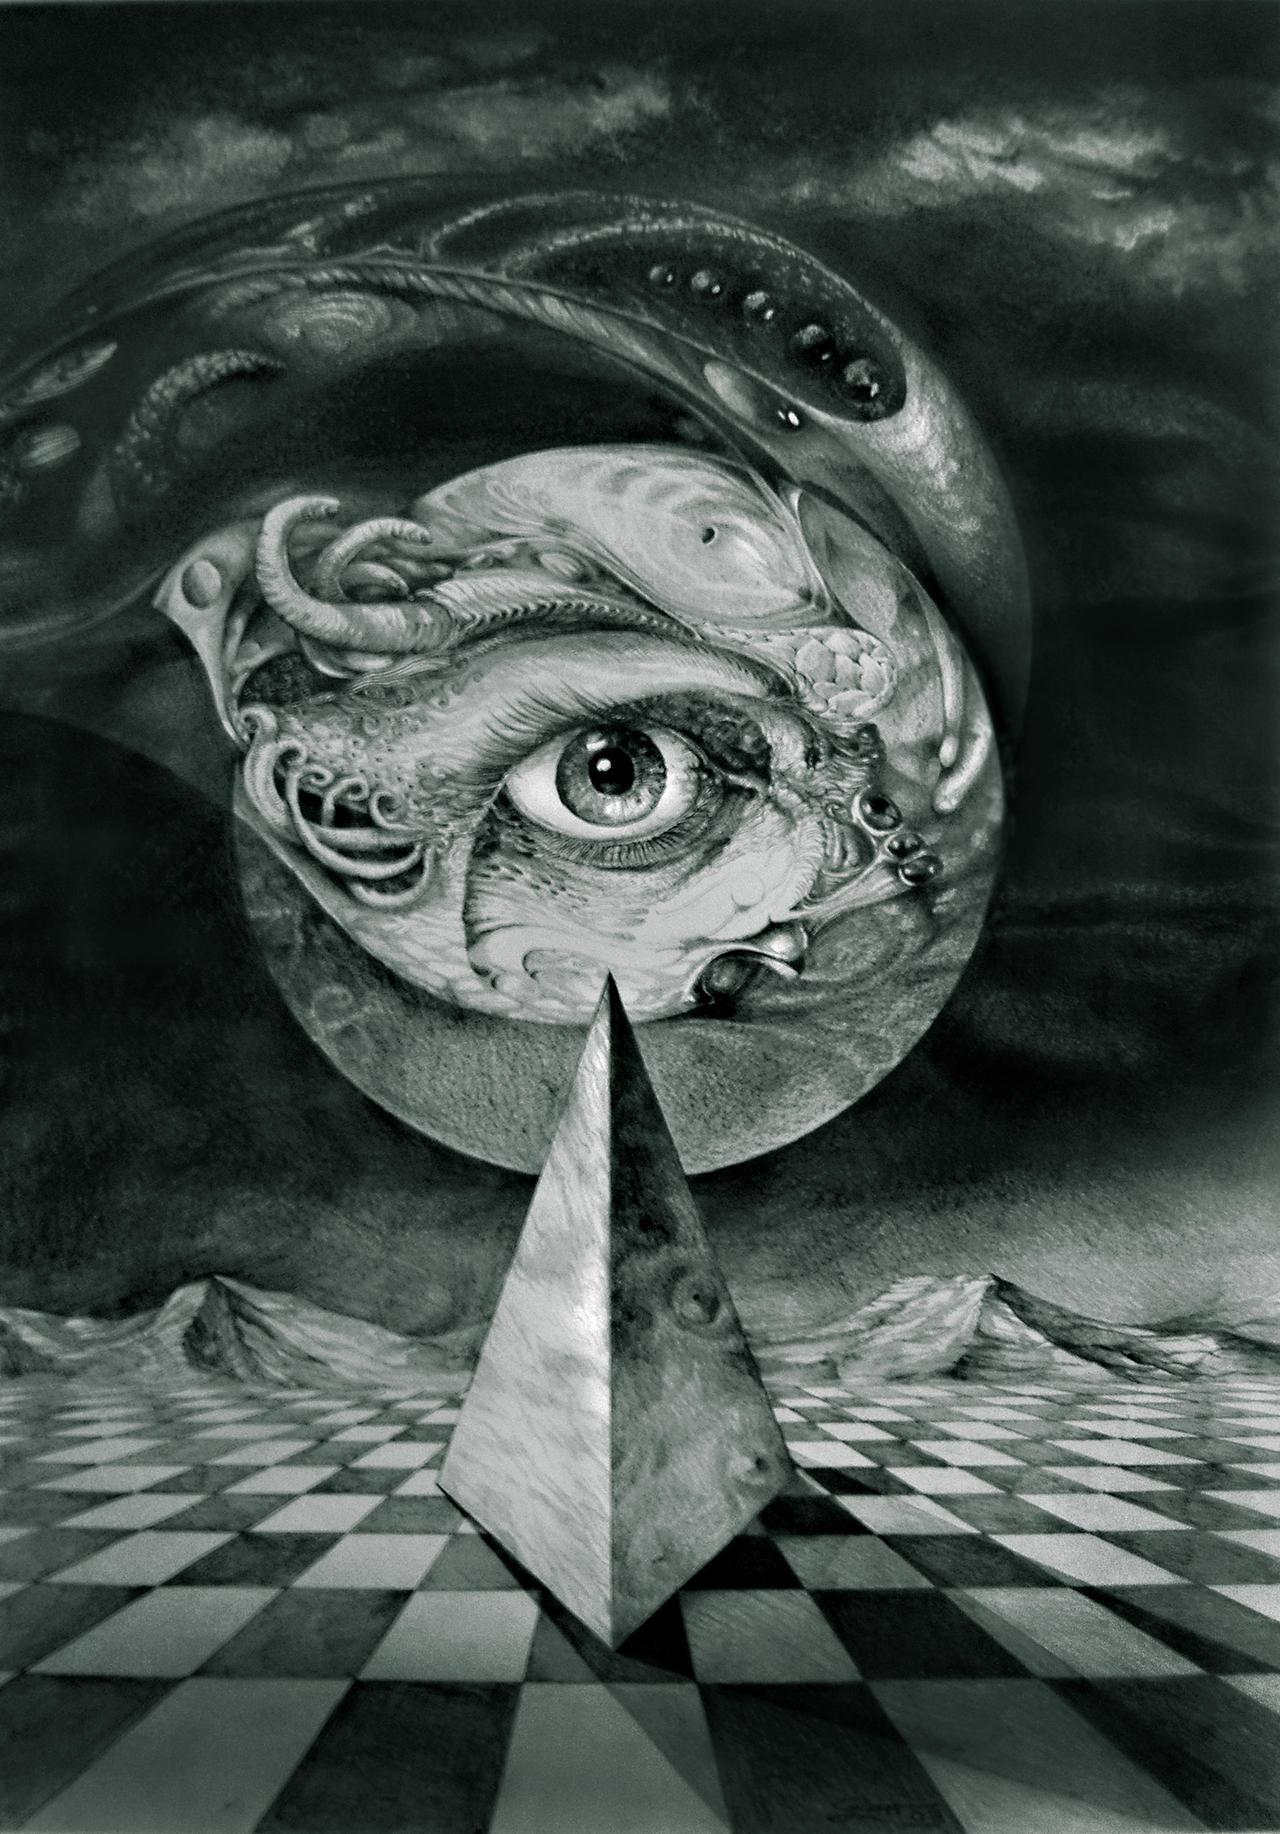 EYE OF THE DARK STAR 2 by ArtOfTheMystic